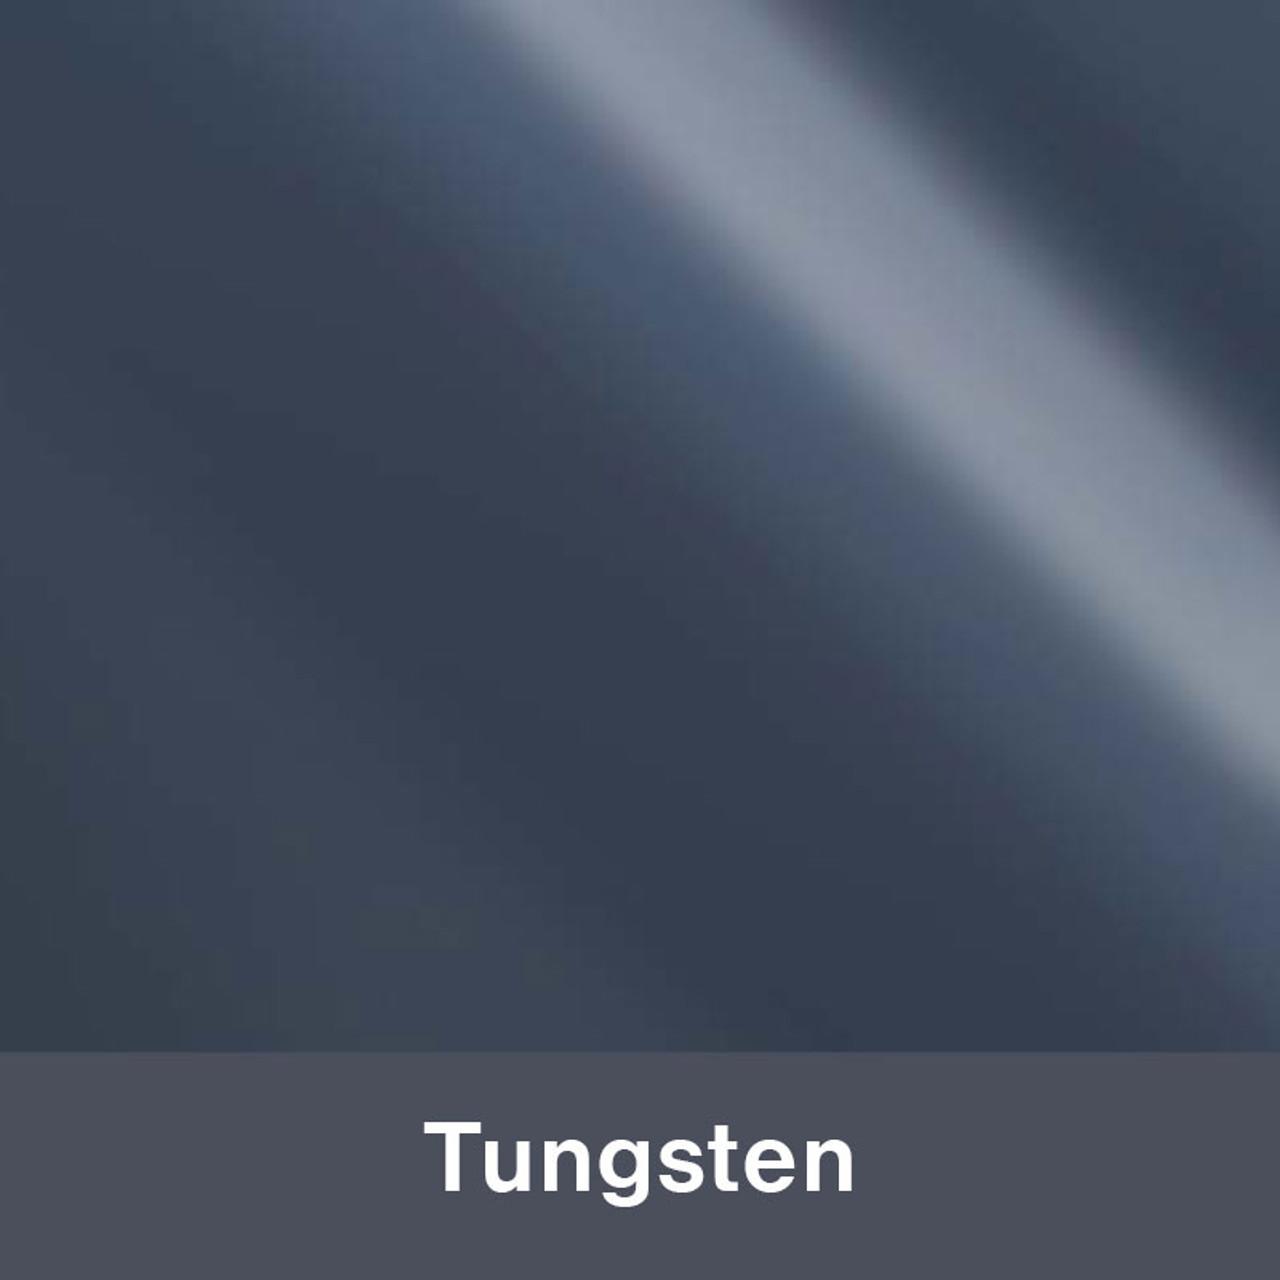 "Iron-on Tungsten Electric 12"" x 14.75"""